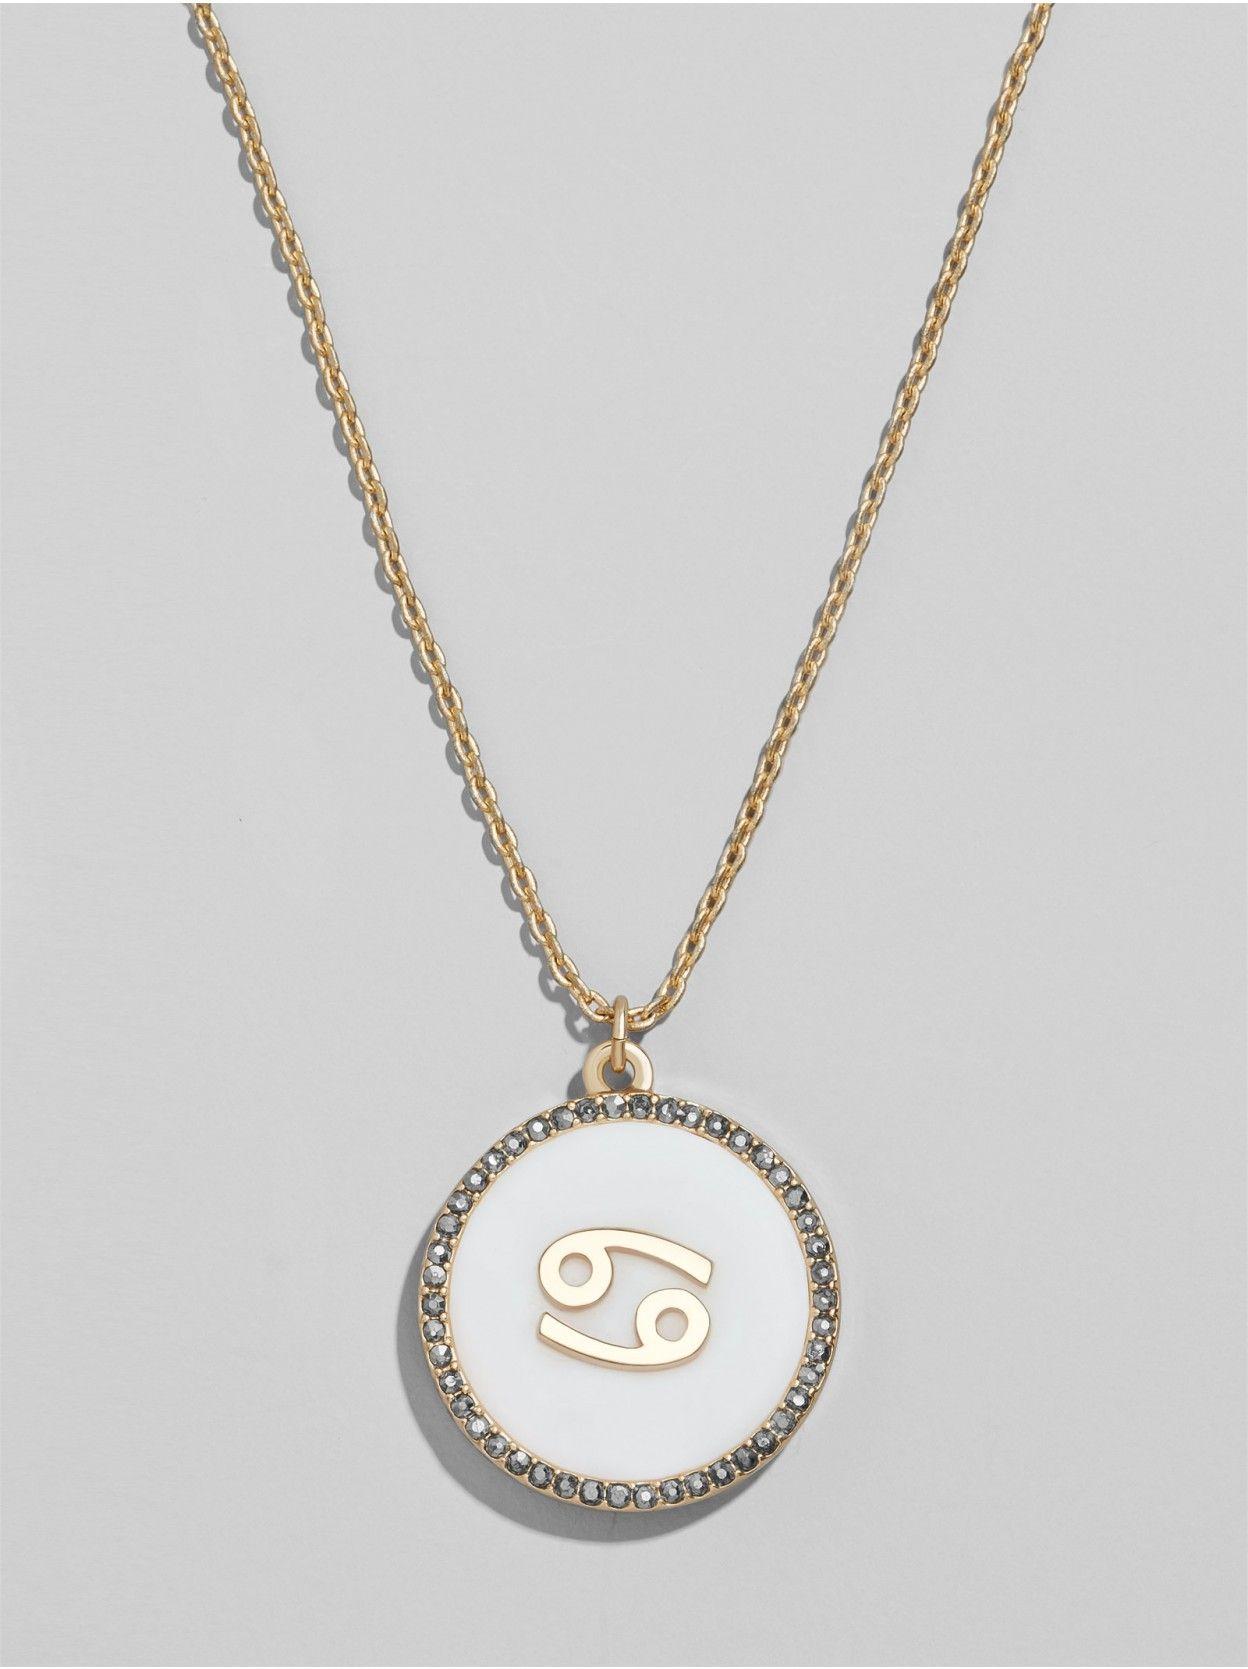 Baublebar pendants and rounding